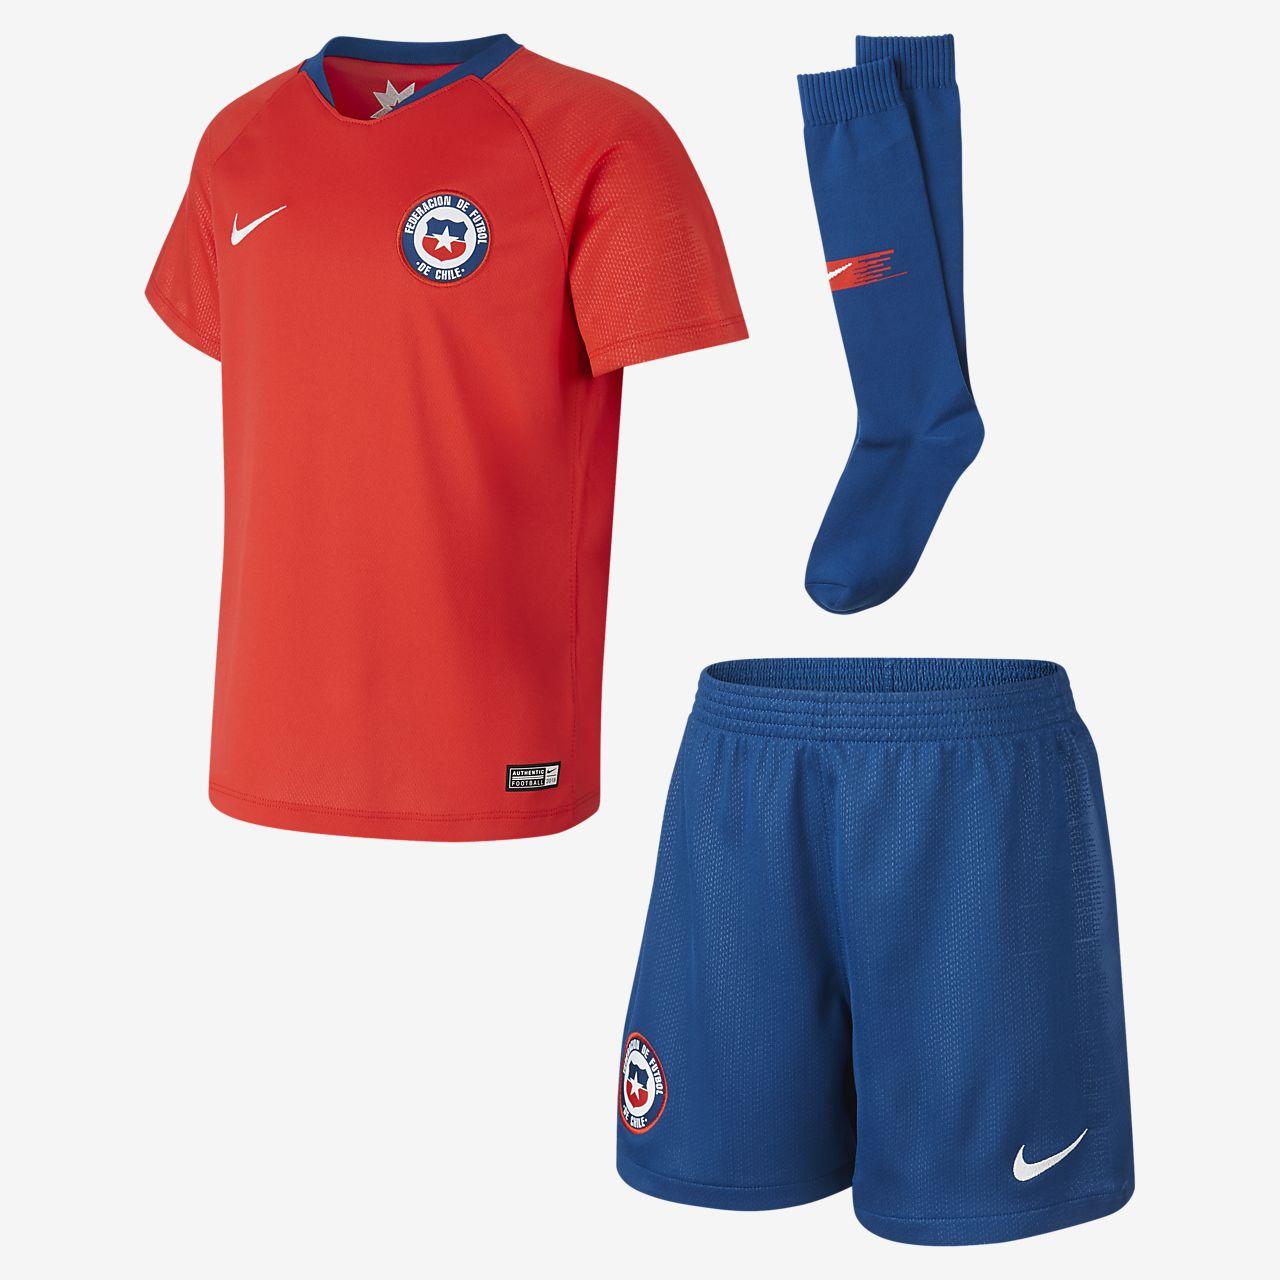 2018 Chile Stadium Home Fußballtrikot-Set für jüngere Kinder